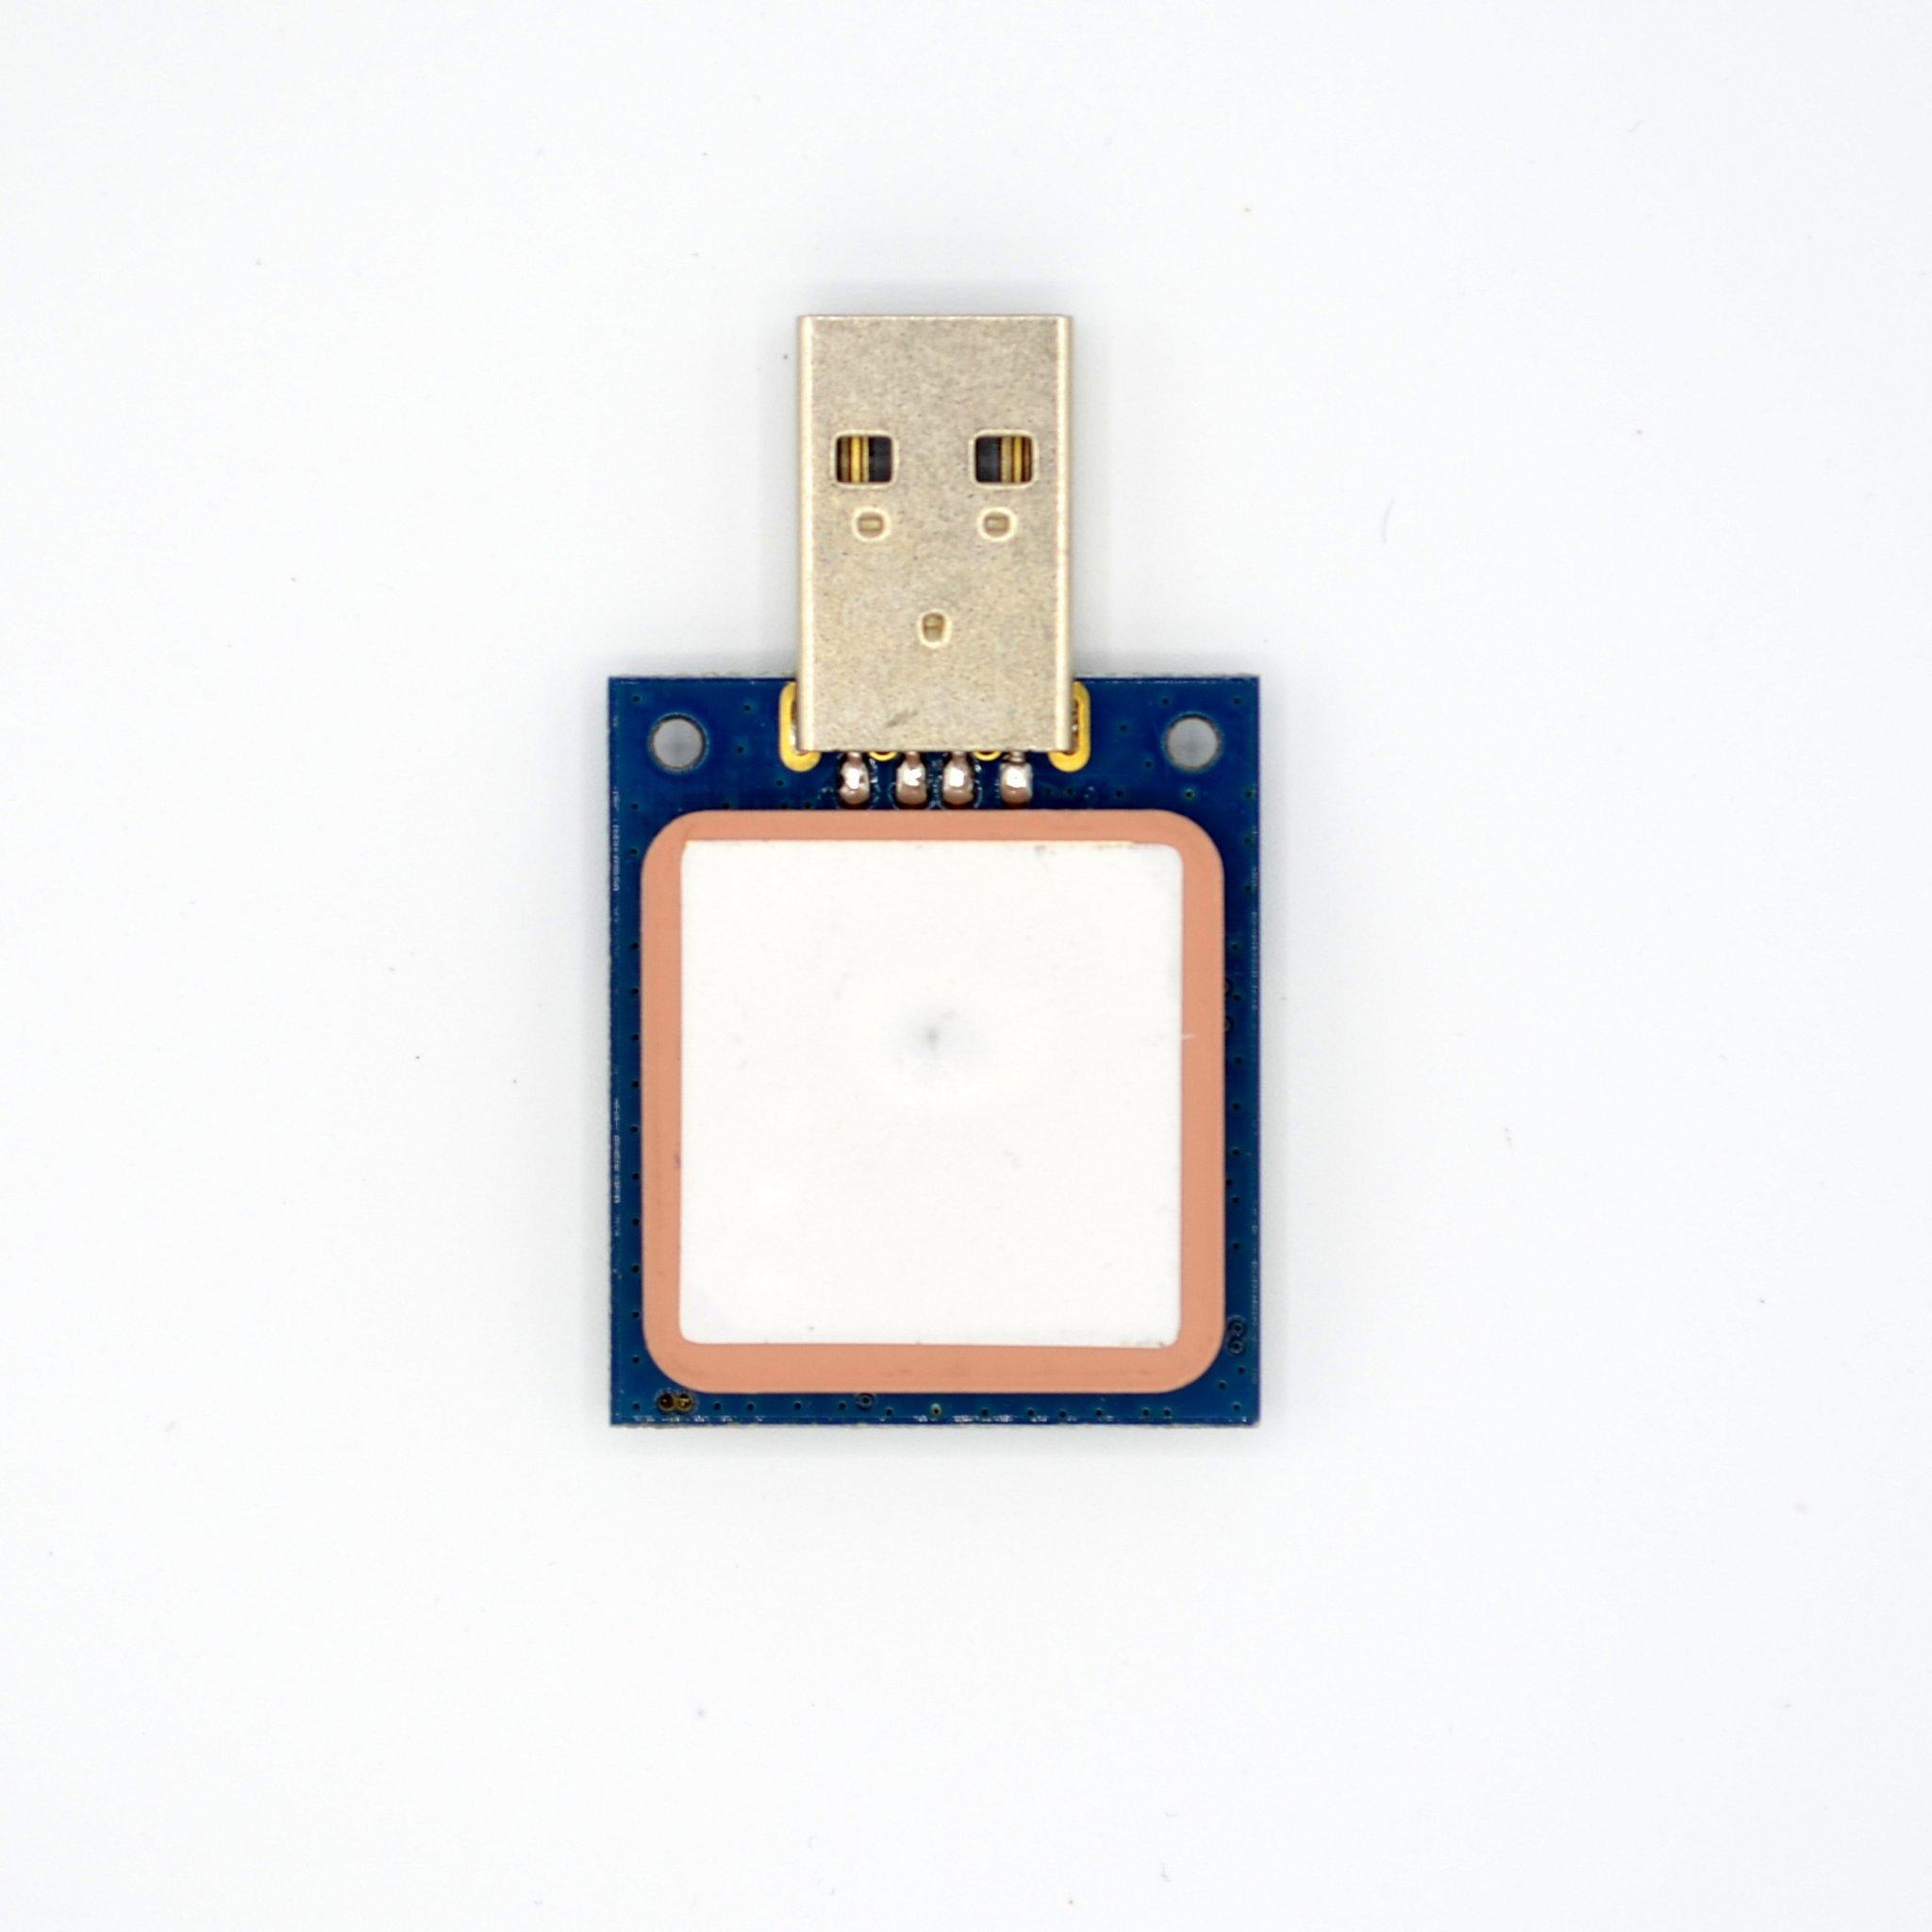 Stratux GPYes 2.0 u-blox 8 GPS unit by Stratux